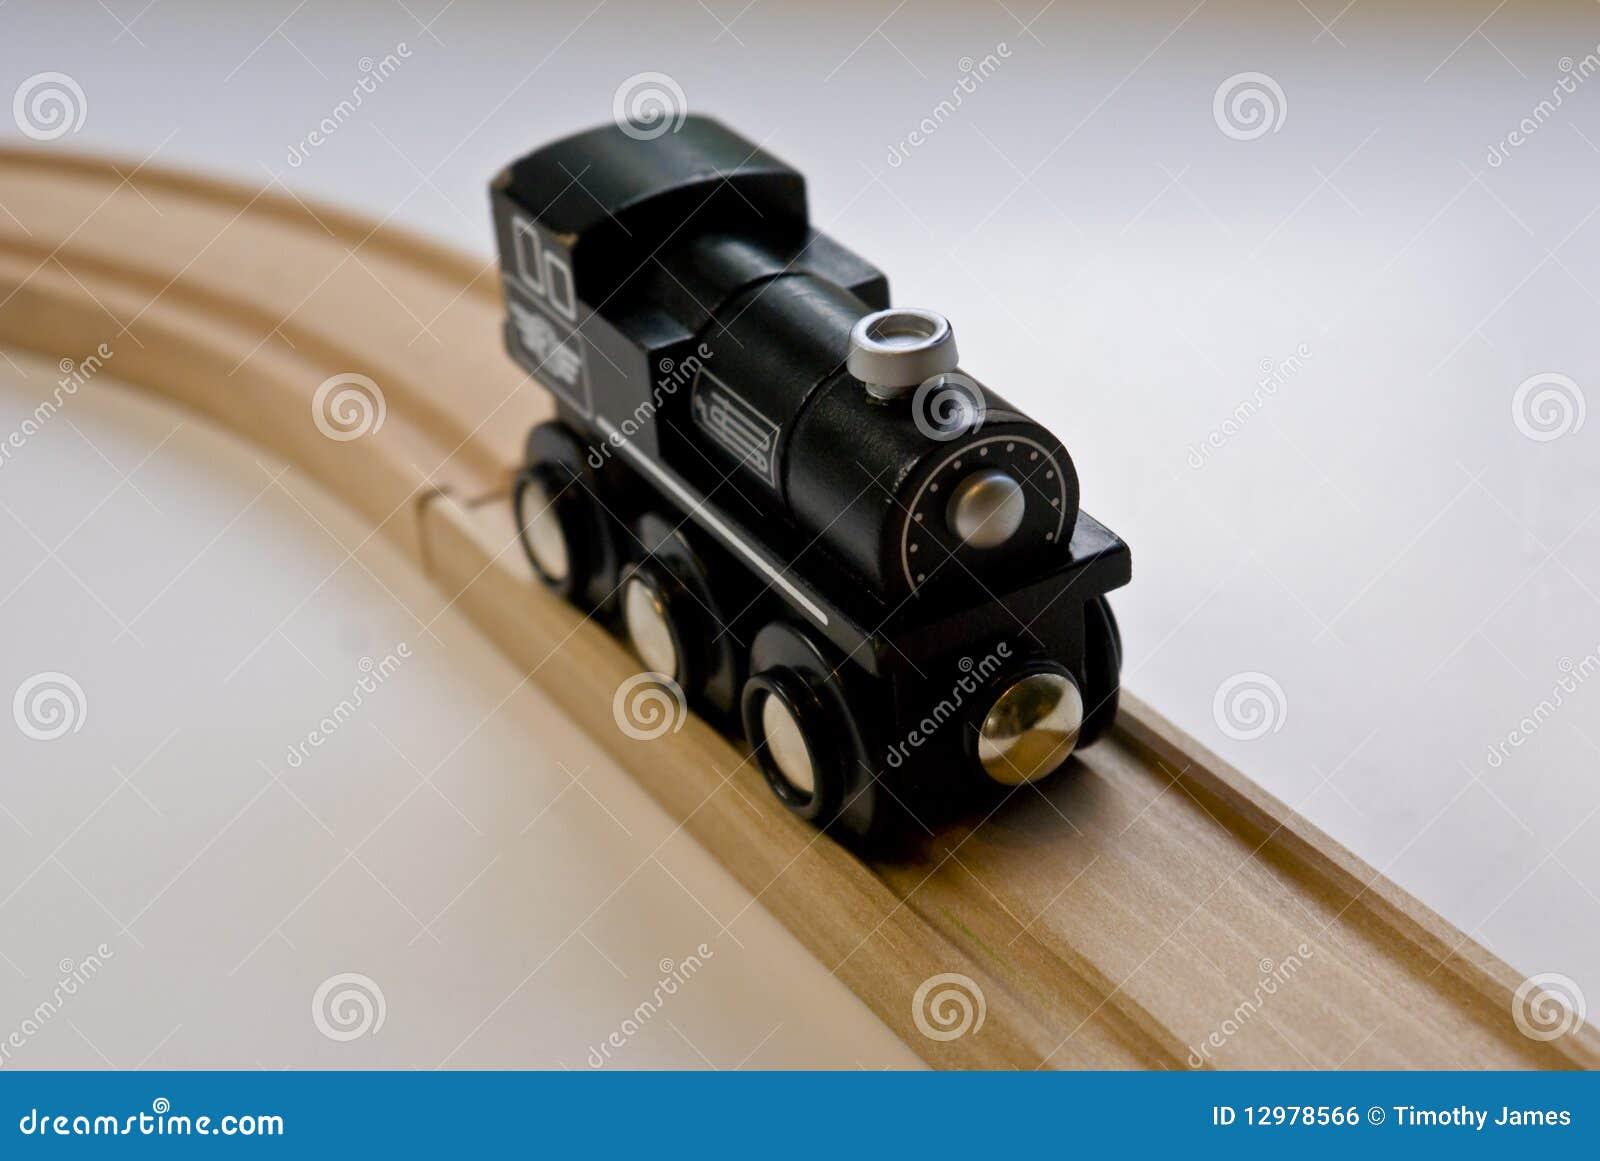 Child's Black Wooden Toy Train On Wood Tracks Royalty Free Stock Image - Image: 12978566